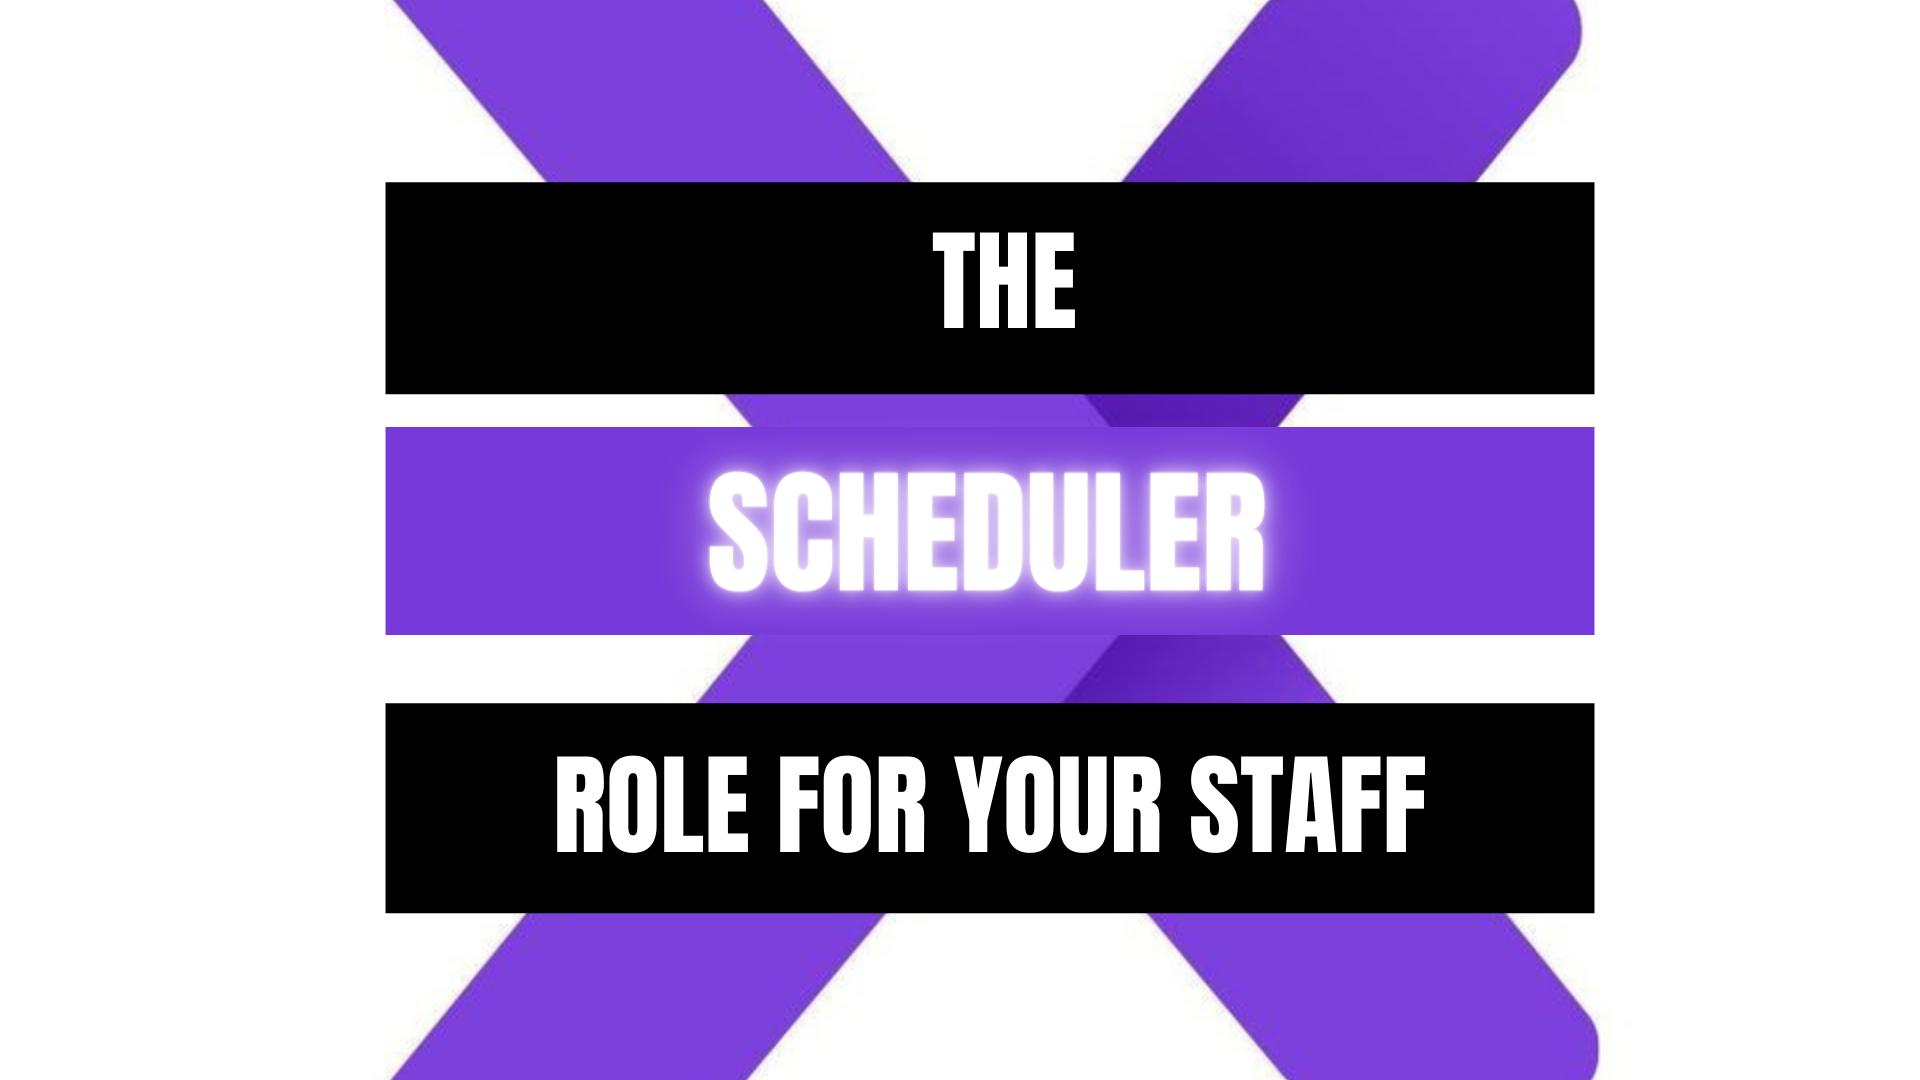 Peekaboox - Company Scheduler Role